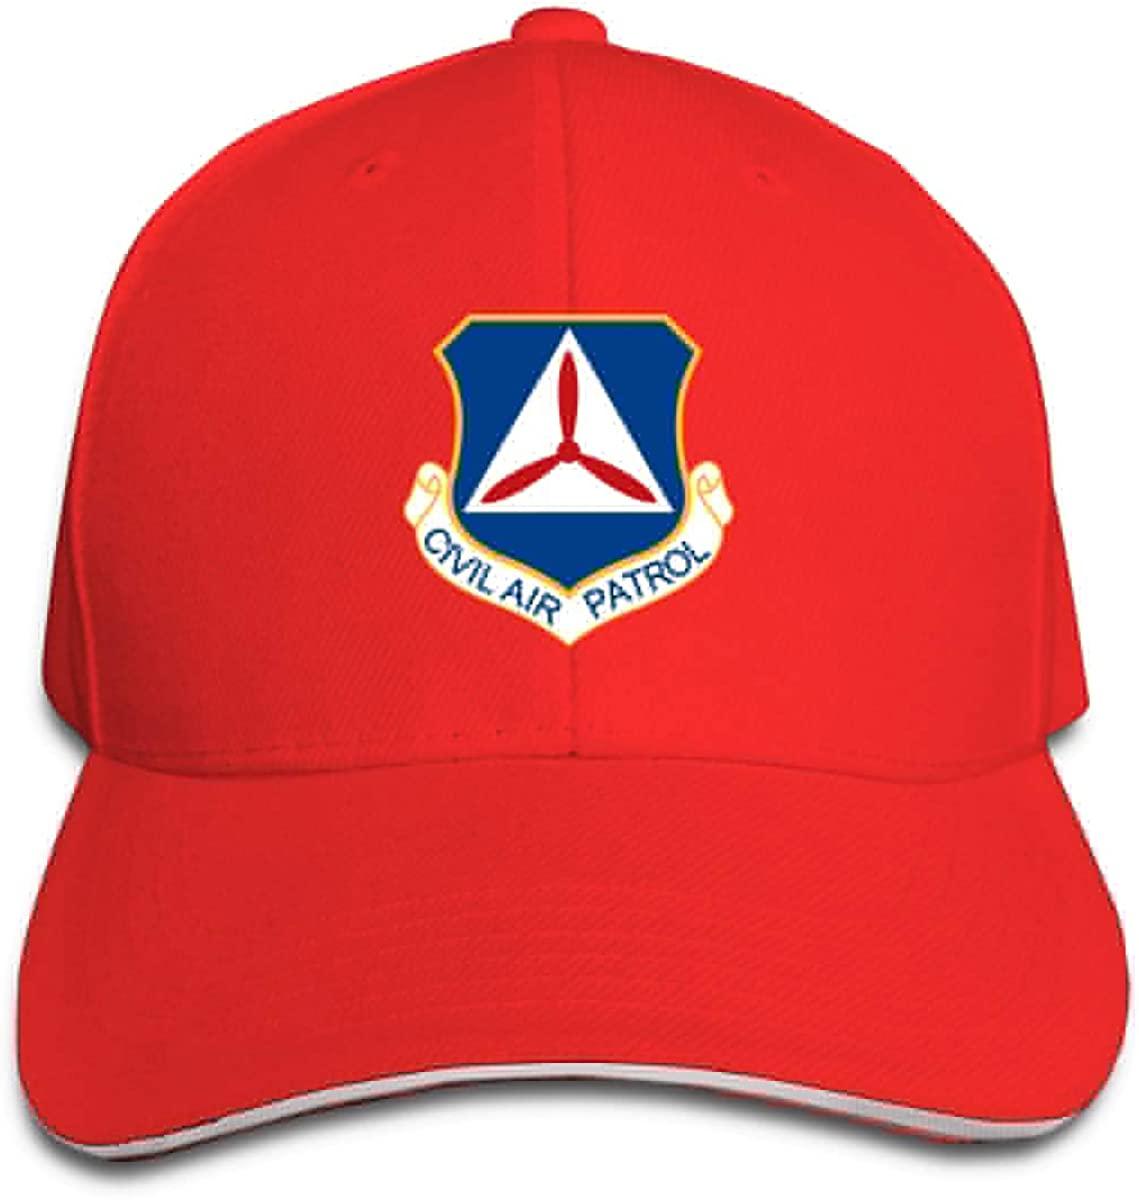 Civil Air Patrol Cap Command Boy Women Classical Hat Fashionable Peak Cap Chapeau